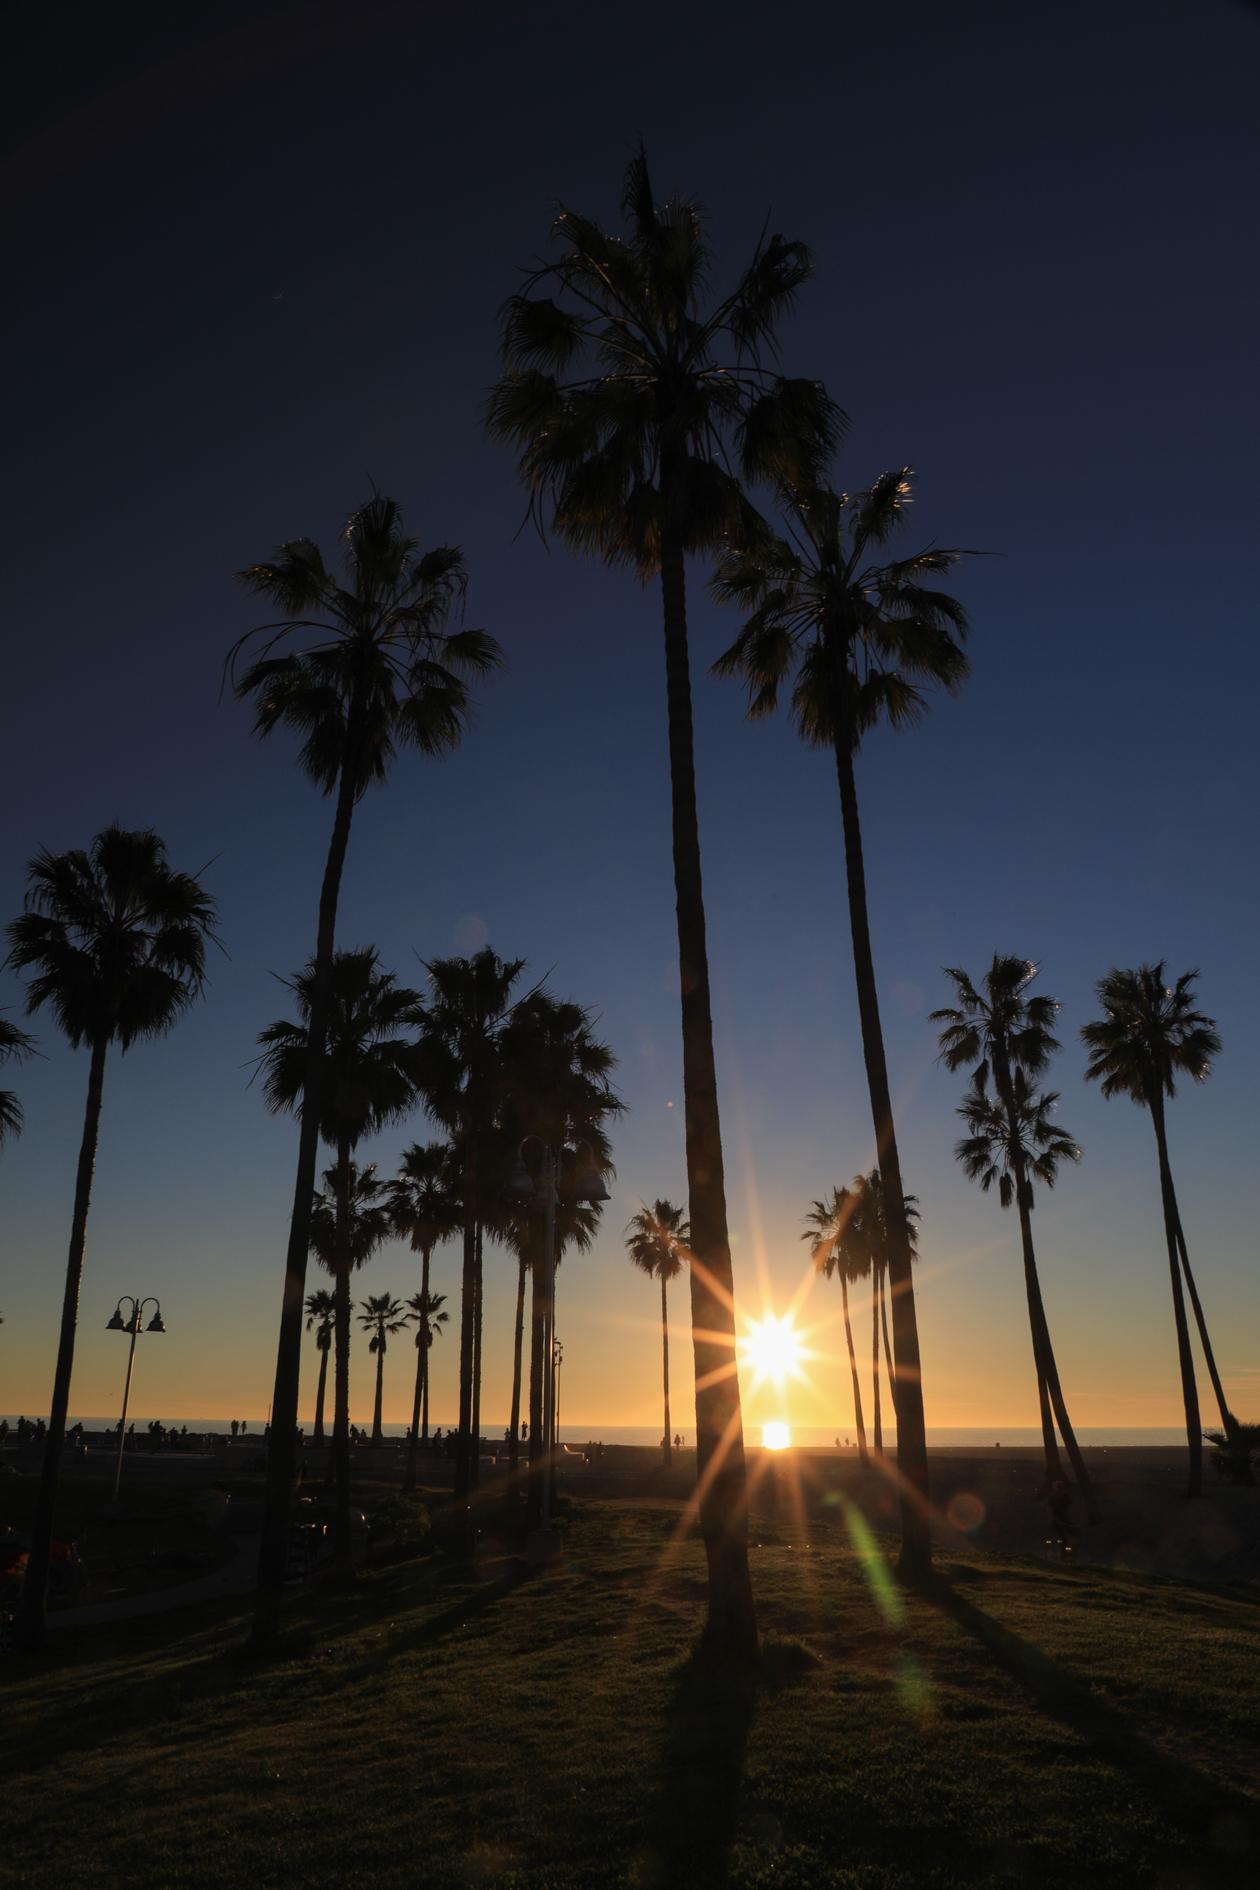 losangeles-palmbomen